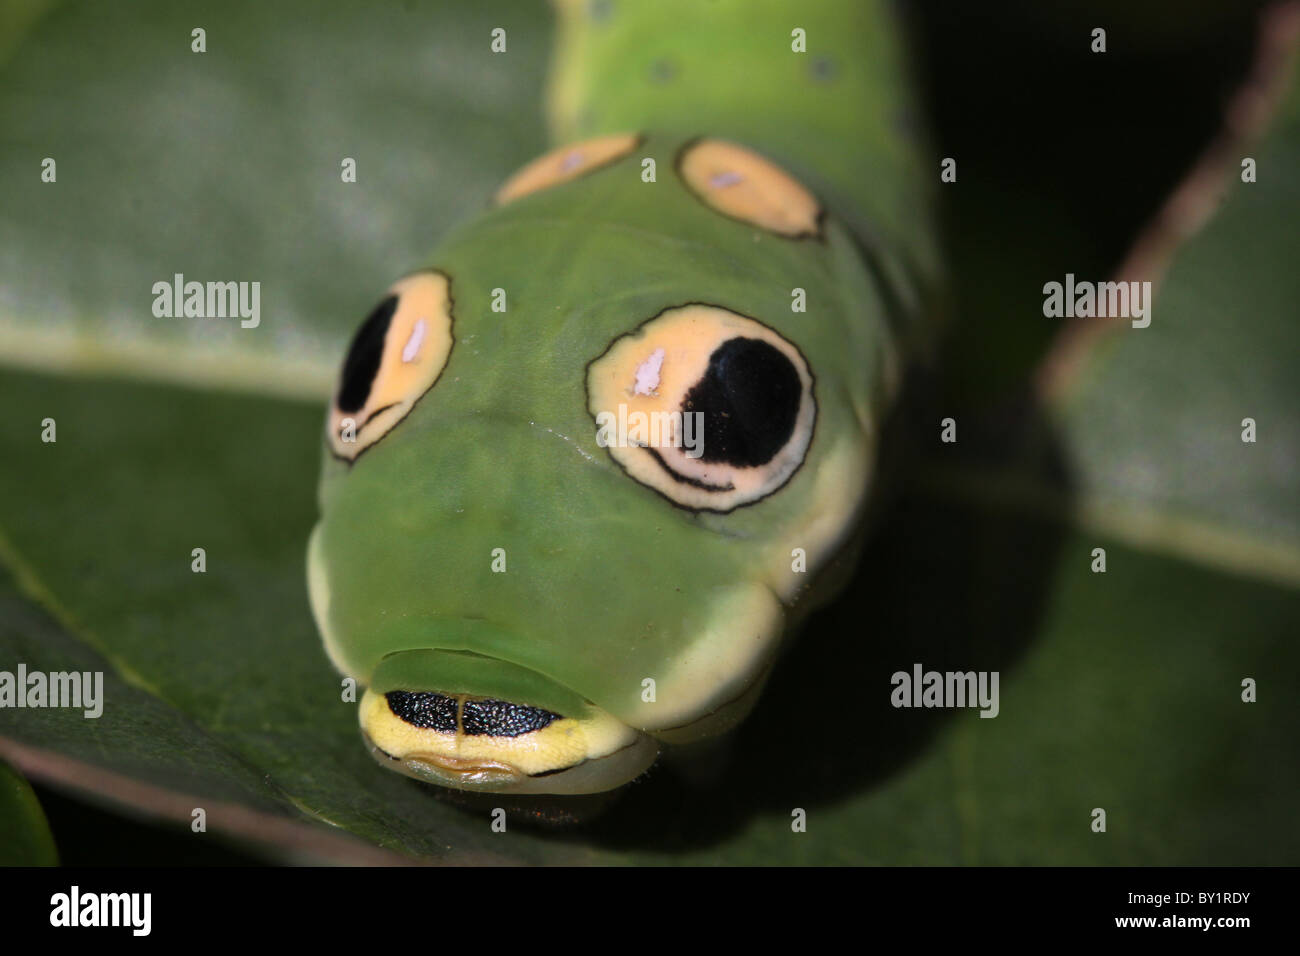 Spicebush Swallowtail caterpillar Snake mimic fake eye spots - Stock Image